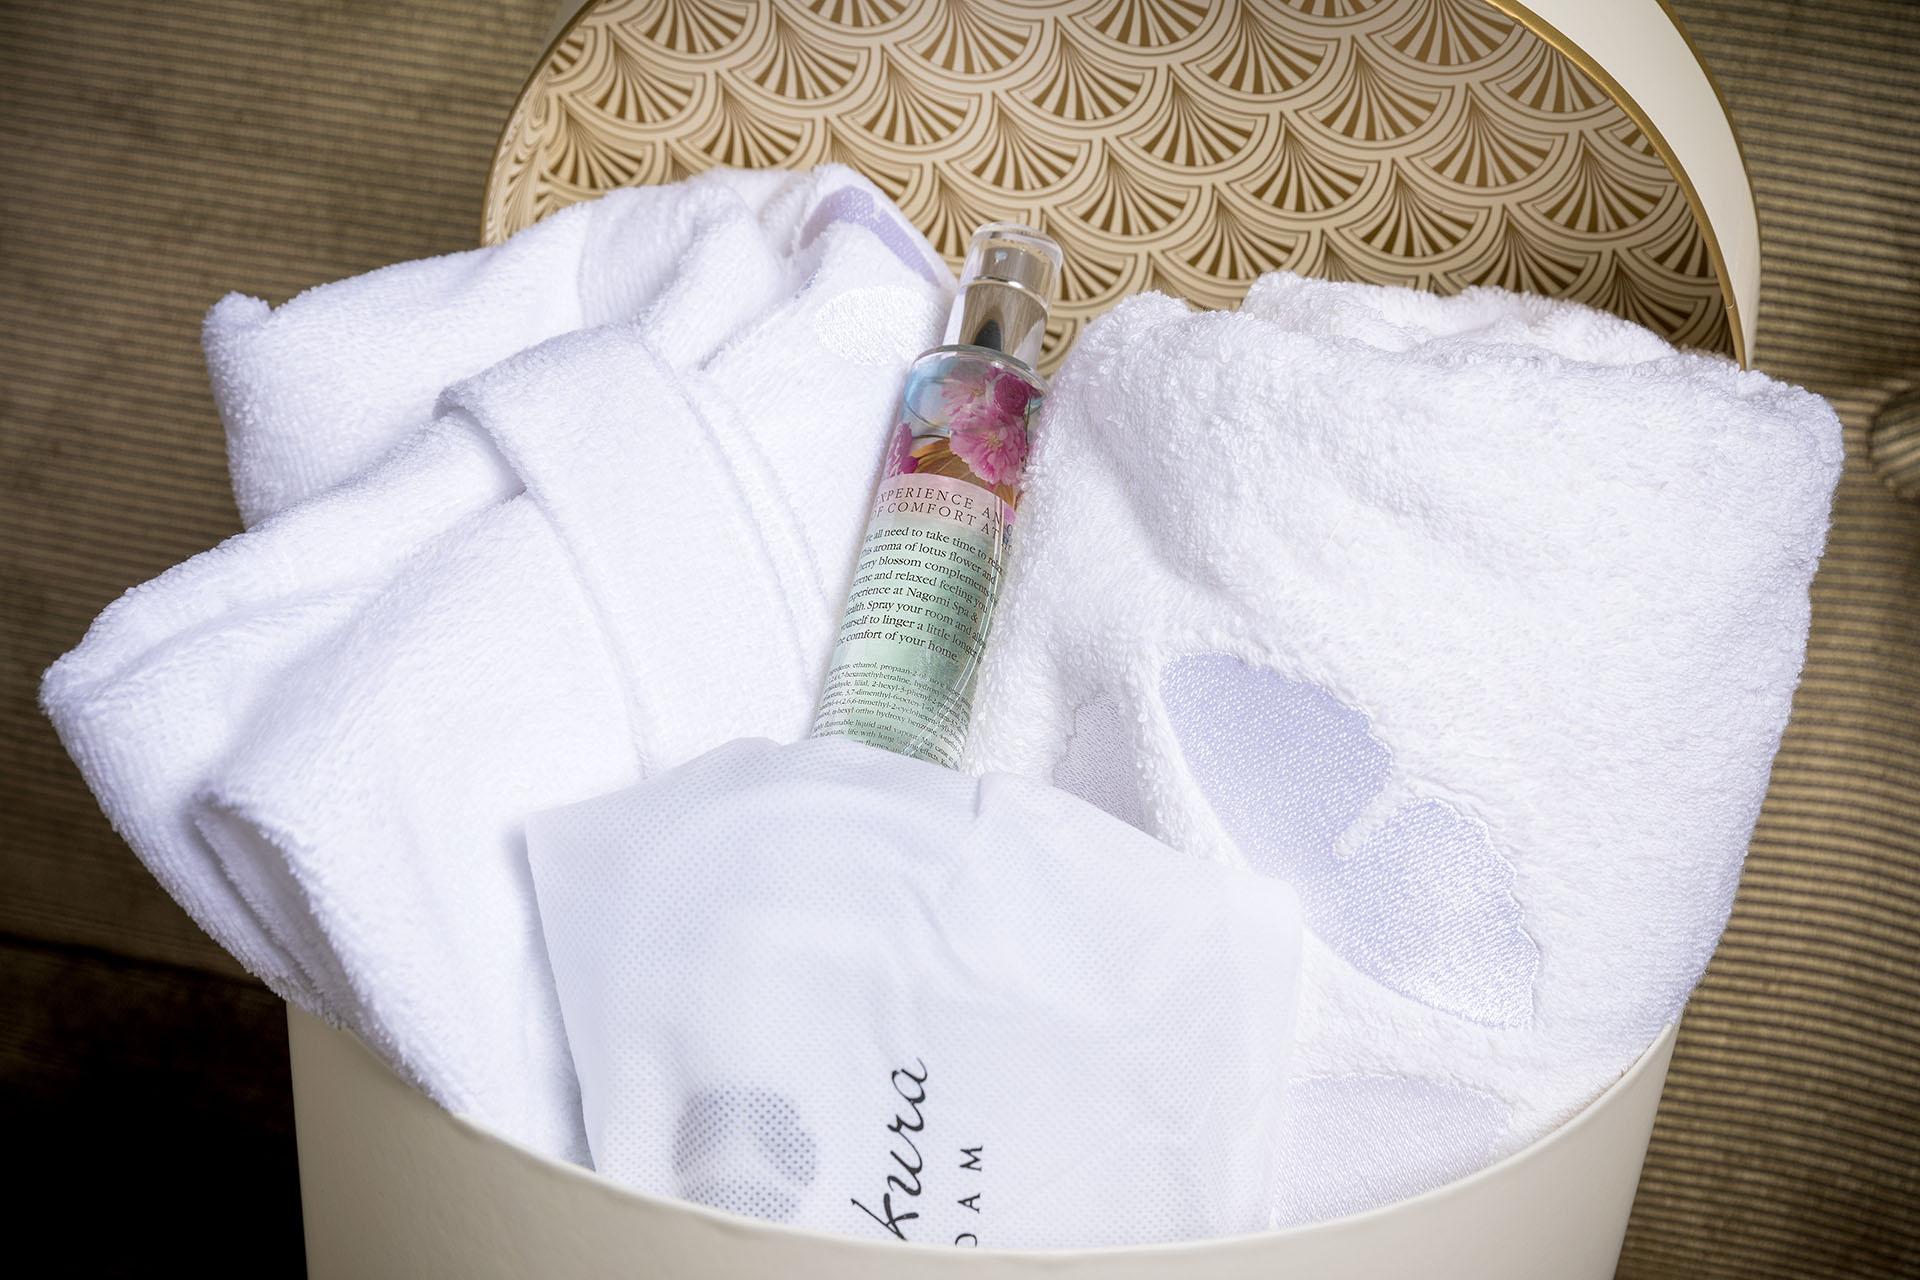 Gift box bathrobe, towel, slippers and room spray